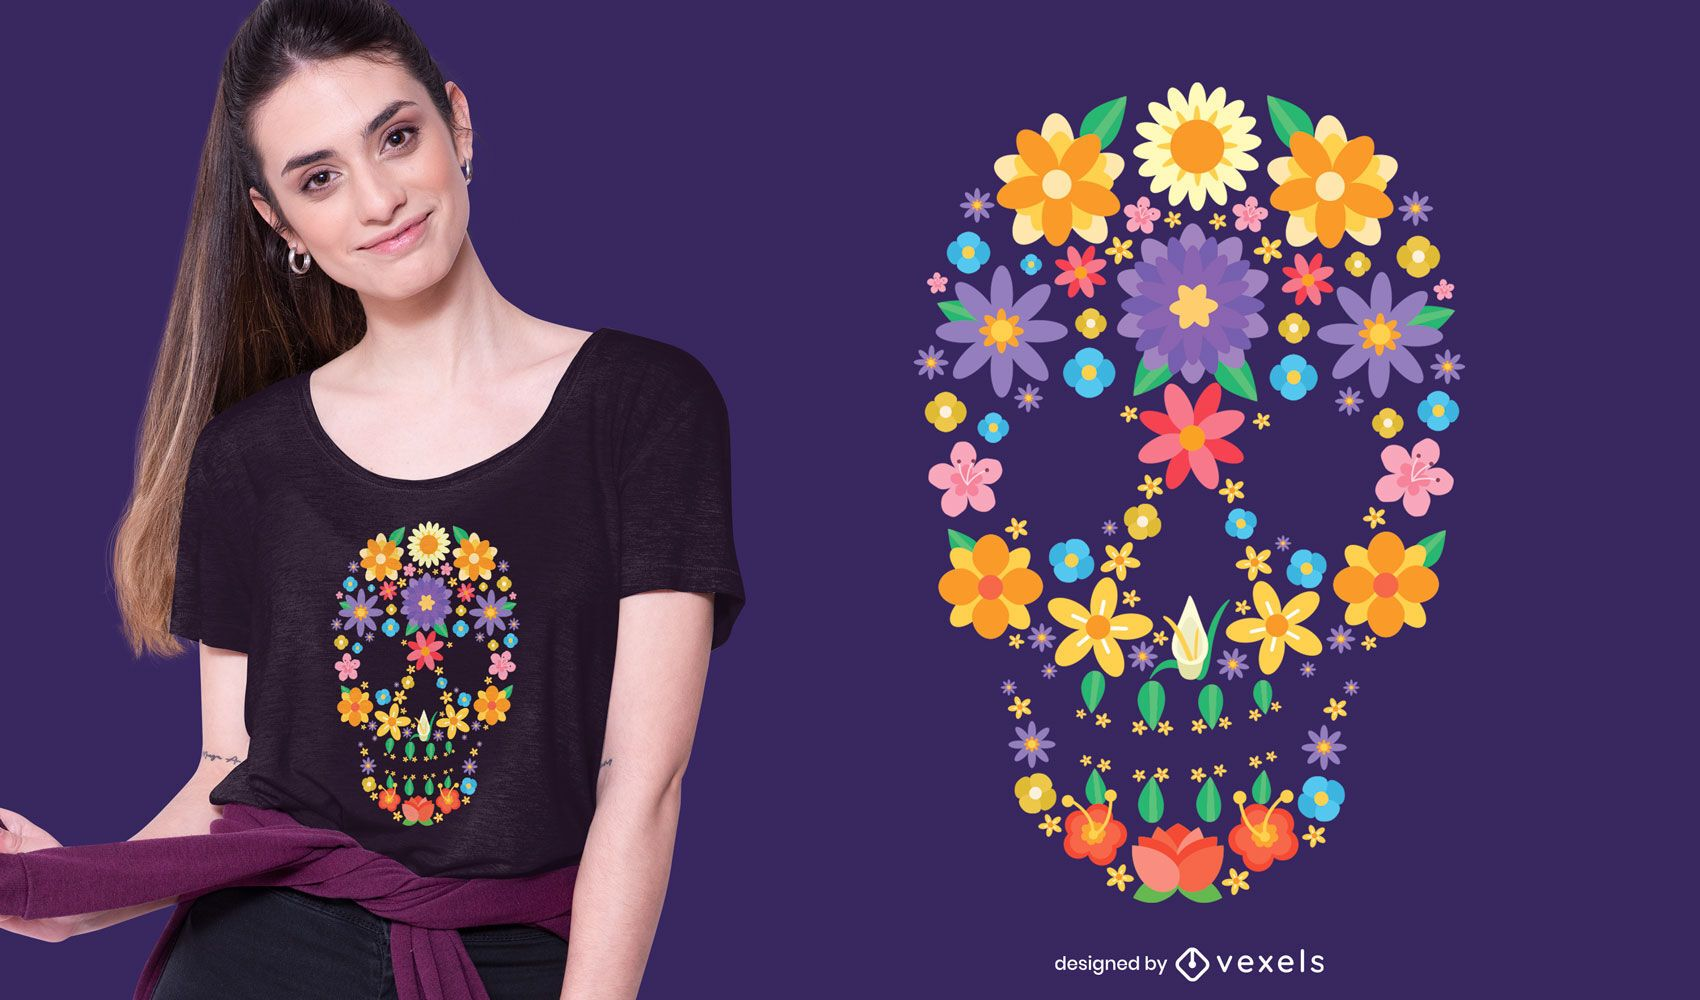 Flower Sugar Skull T-shirt Design